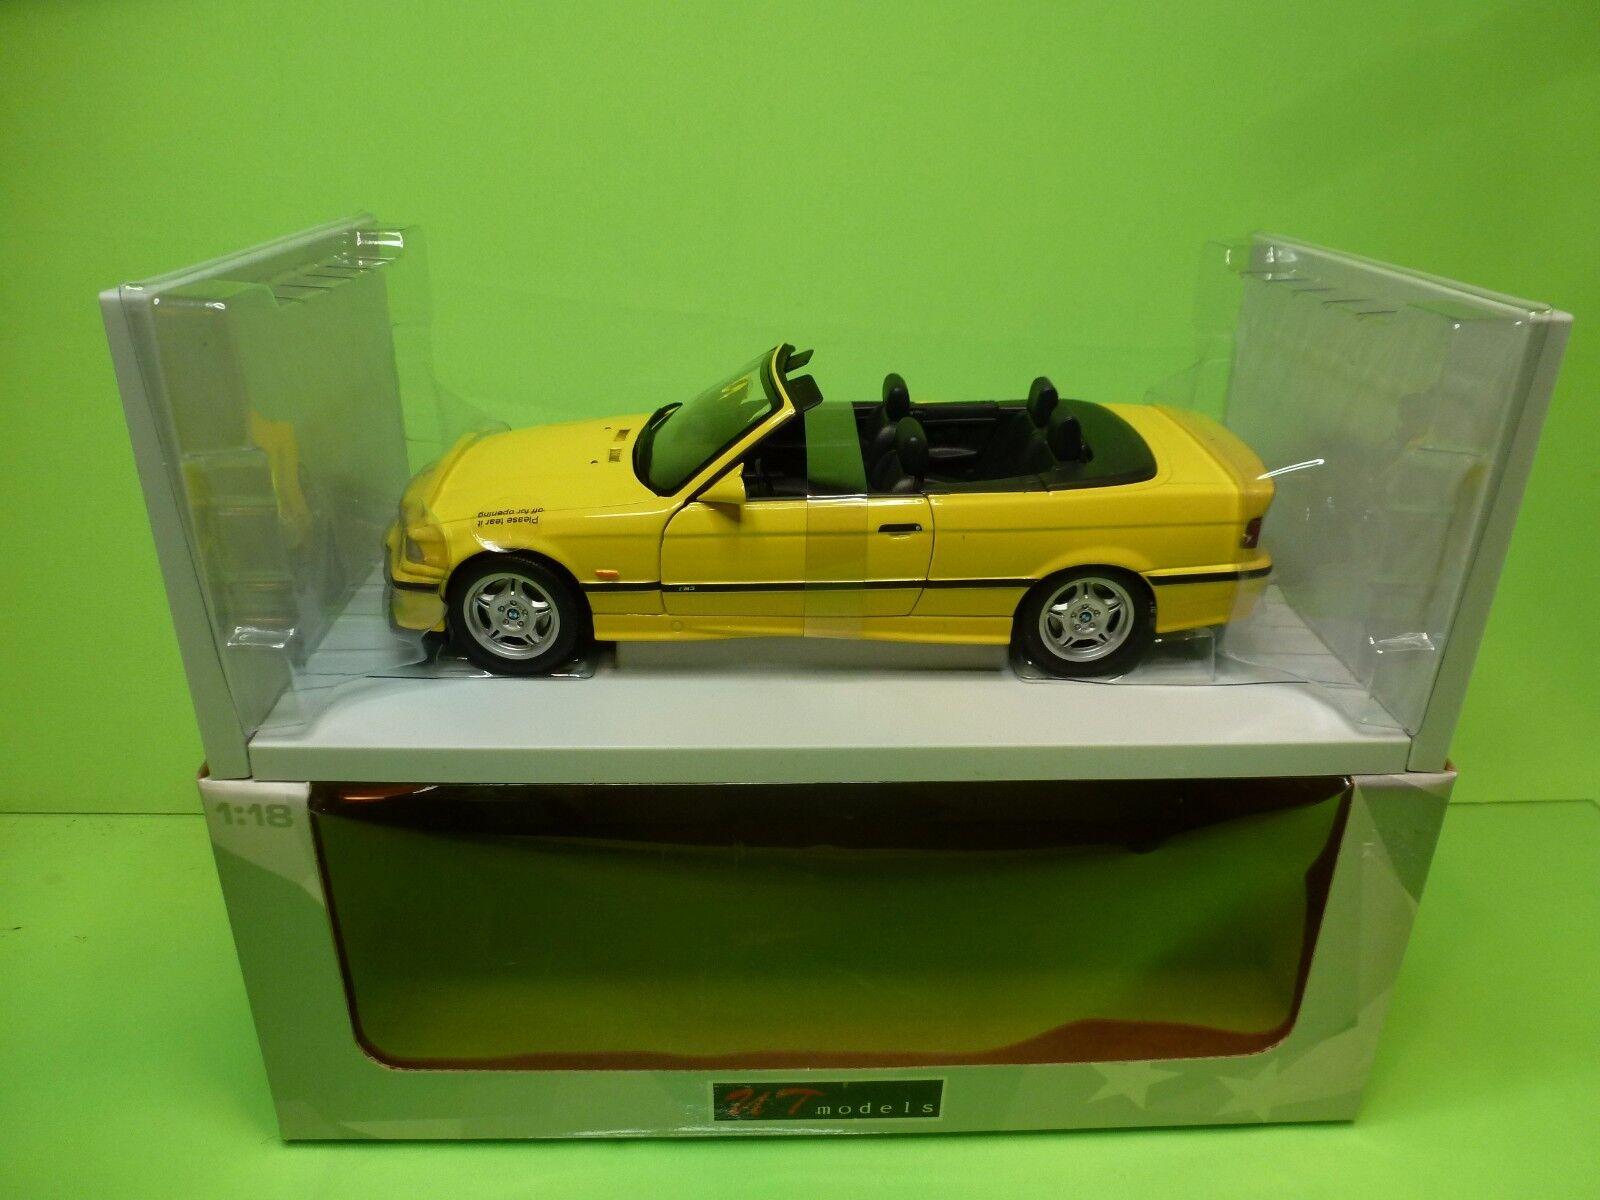 UT MODELS  20473 BMW  M3 CABRIOLET E36 - jaune 1 18 - EXCELLENT IN BOX  grosses soldes